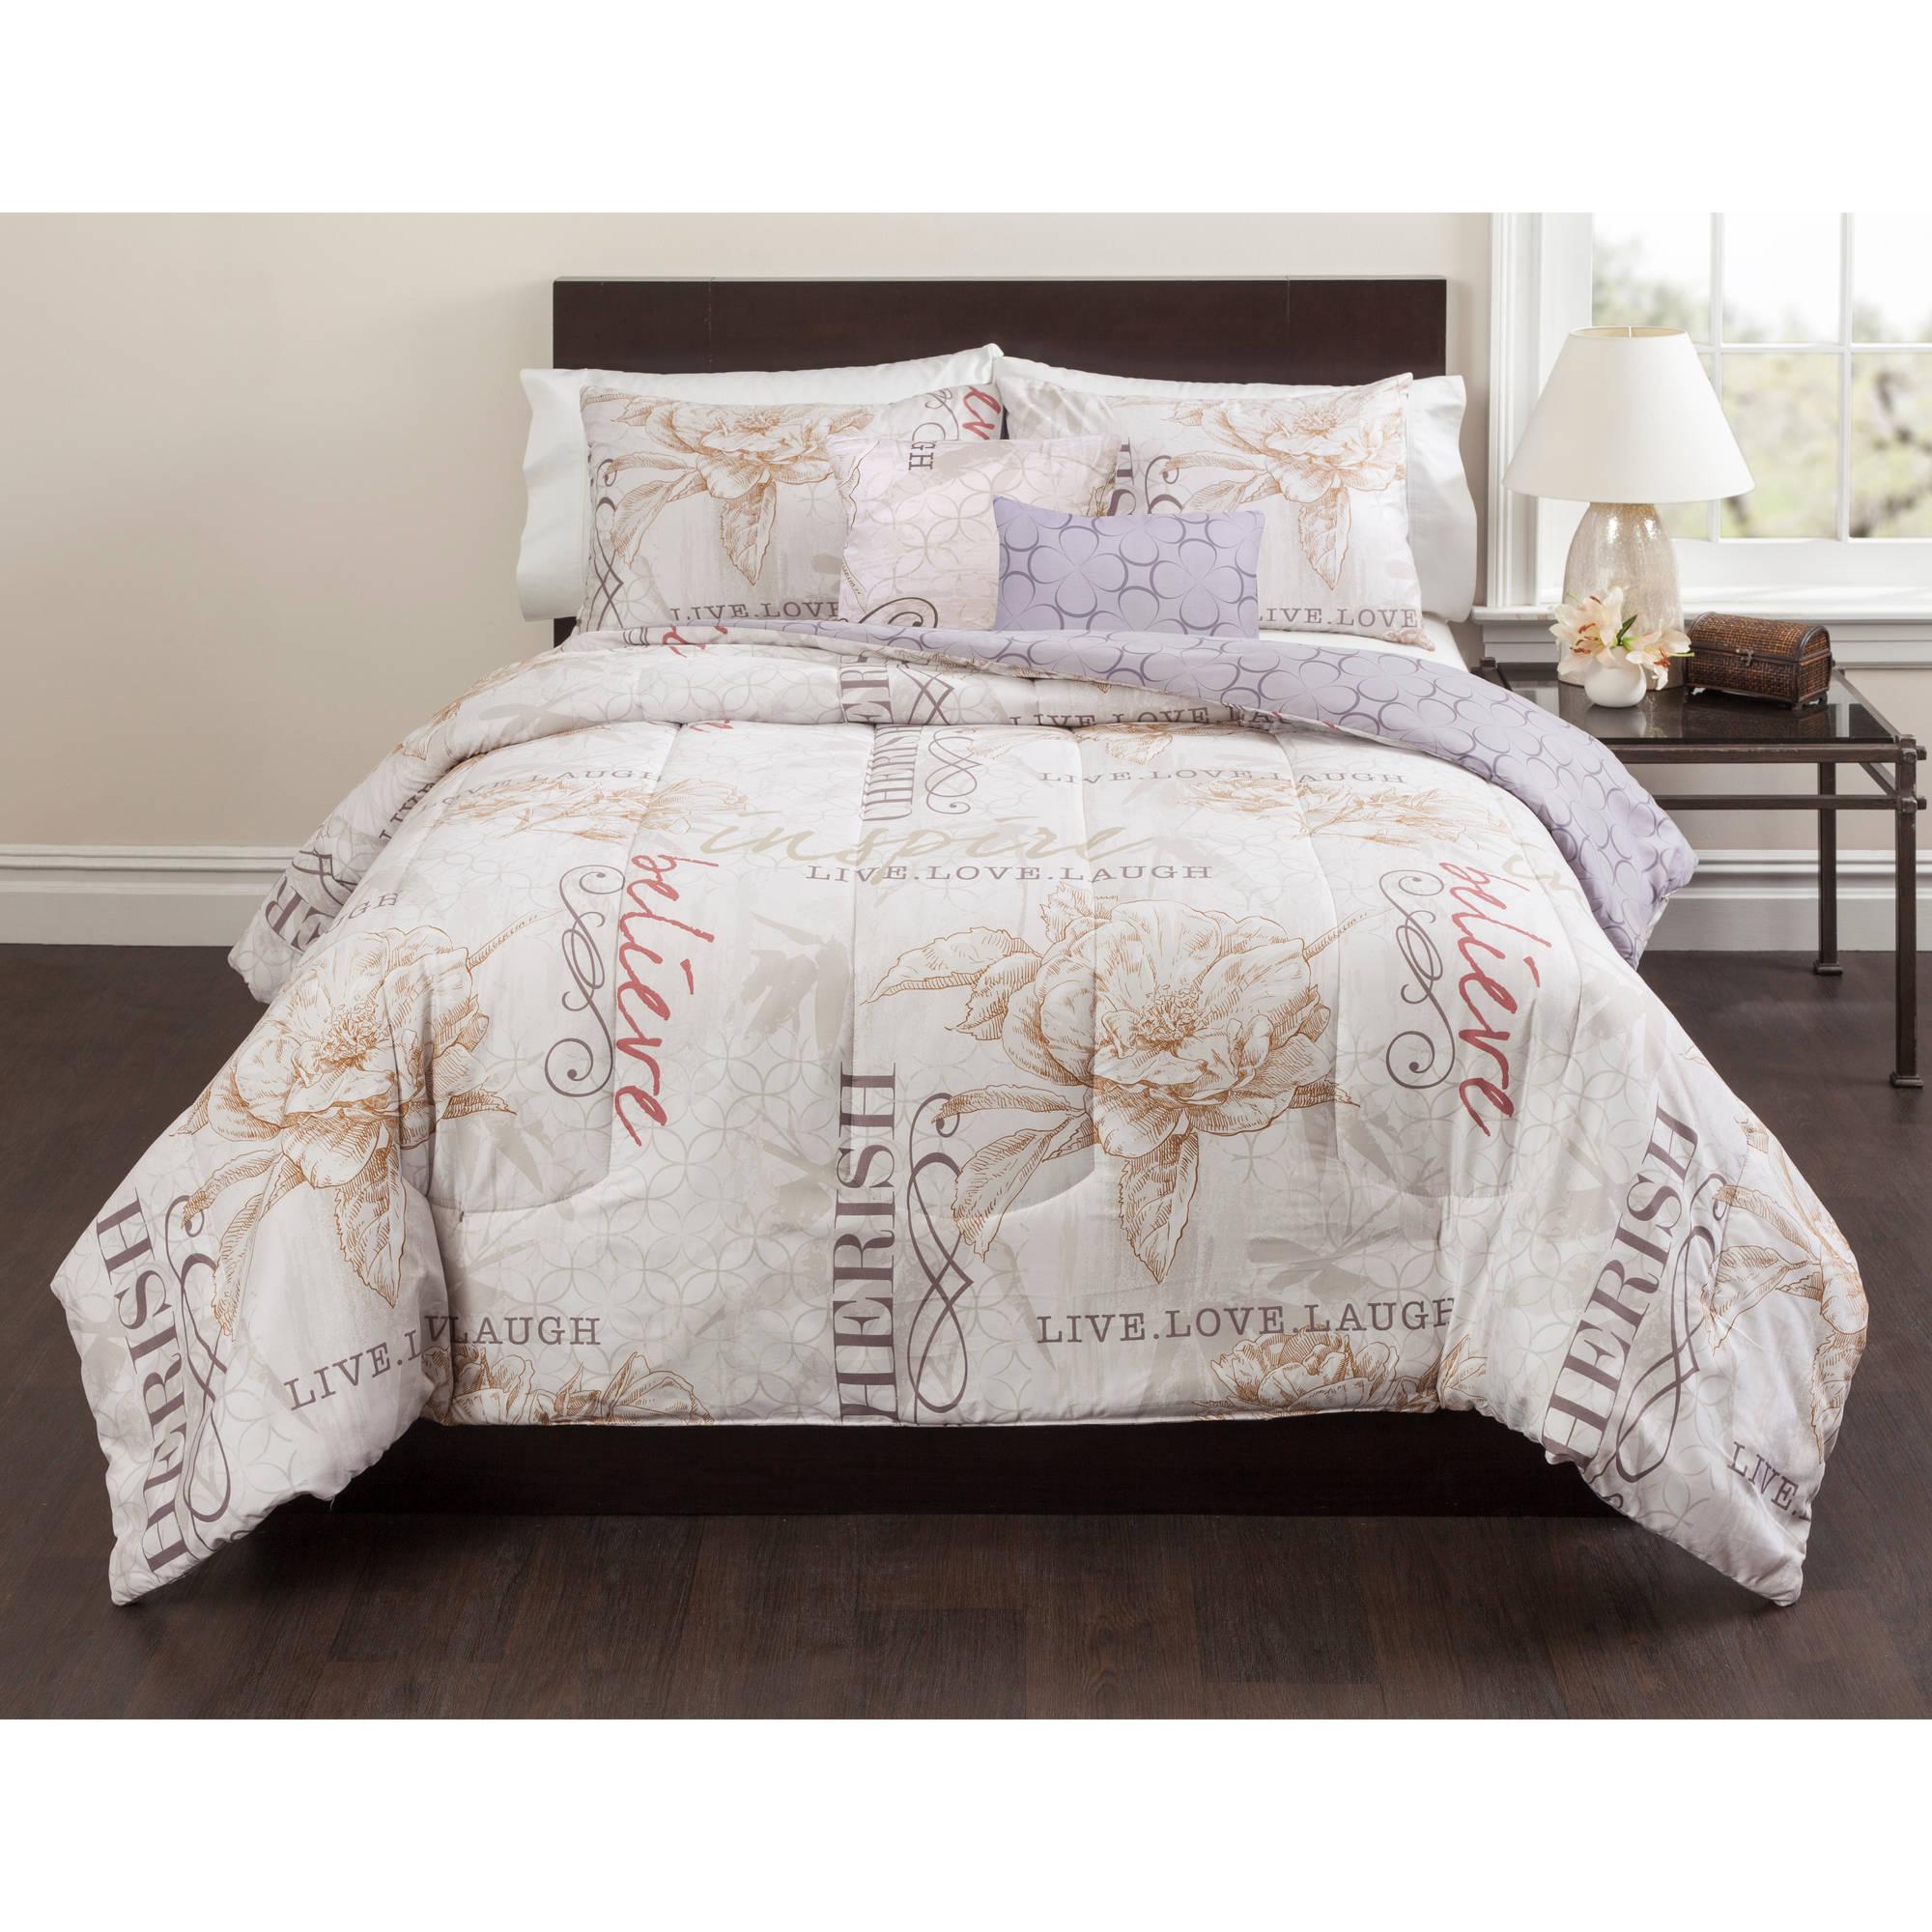 Casa Live Laugh Love 5 Piece Bedding Comforter Set